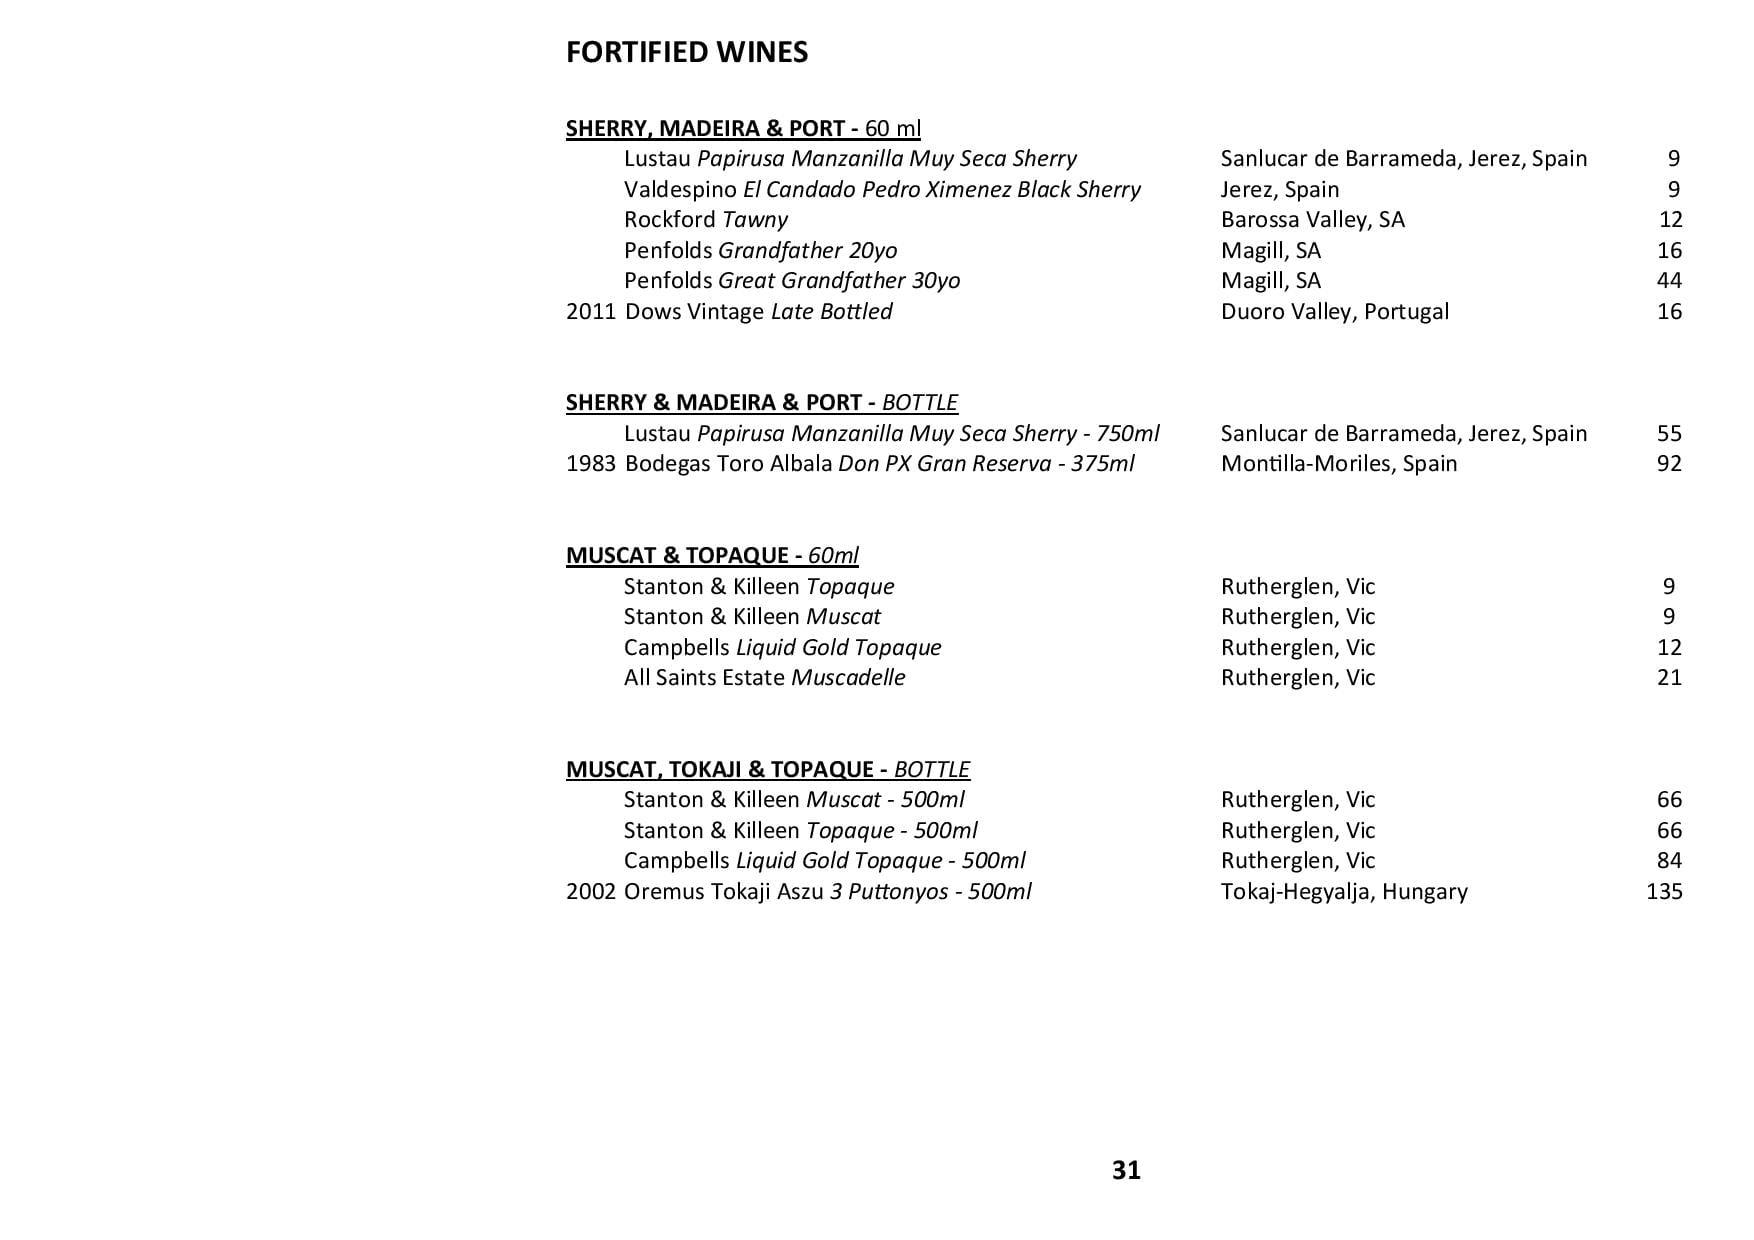 Sails Wine List 2020 Page 031